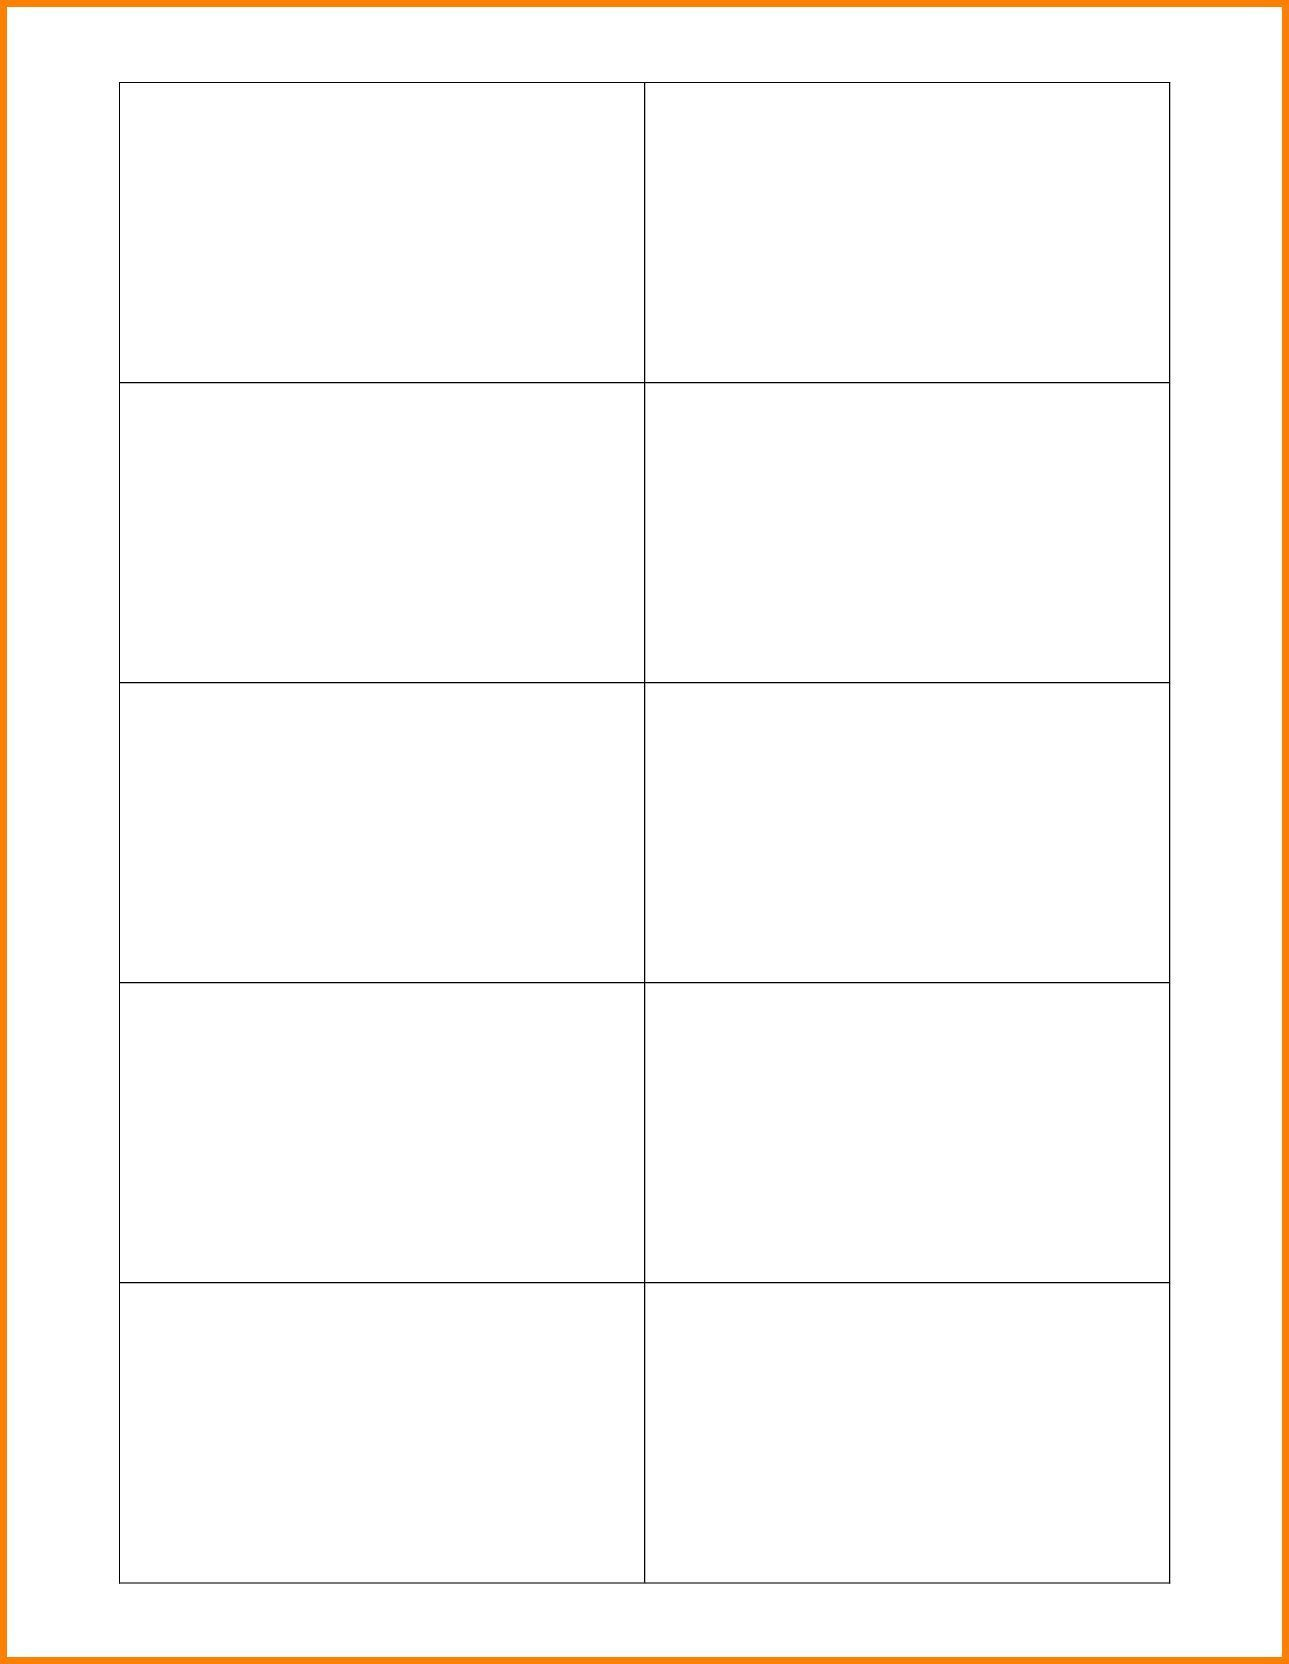 005 Impressive Free Printable Busines Card Template For Word Sample  BlankFull